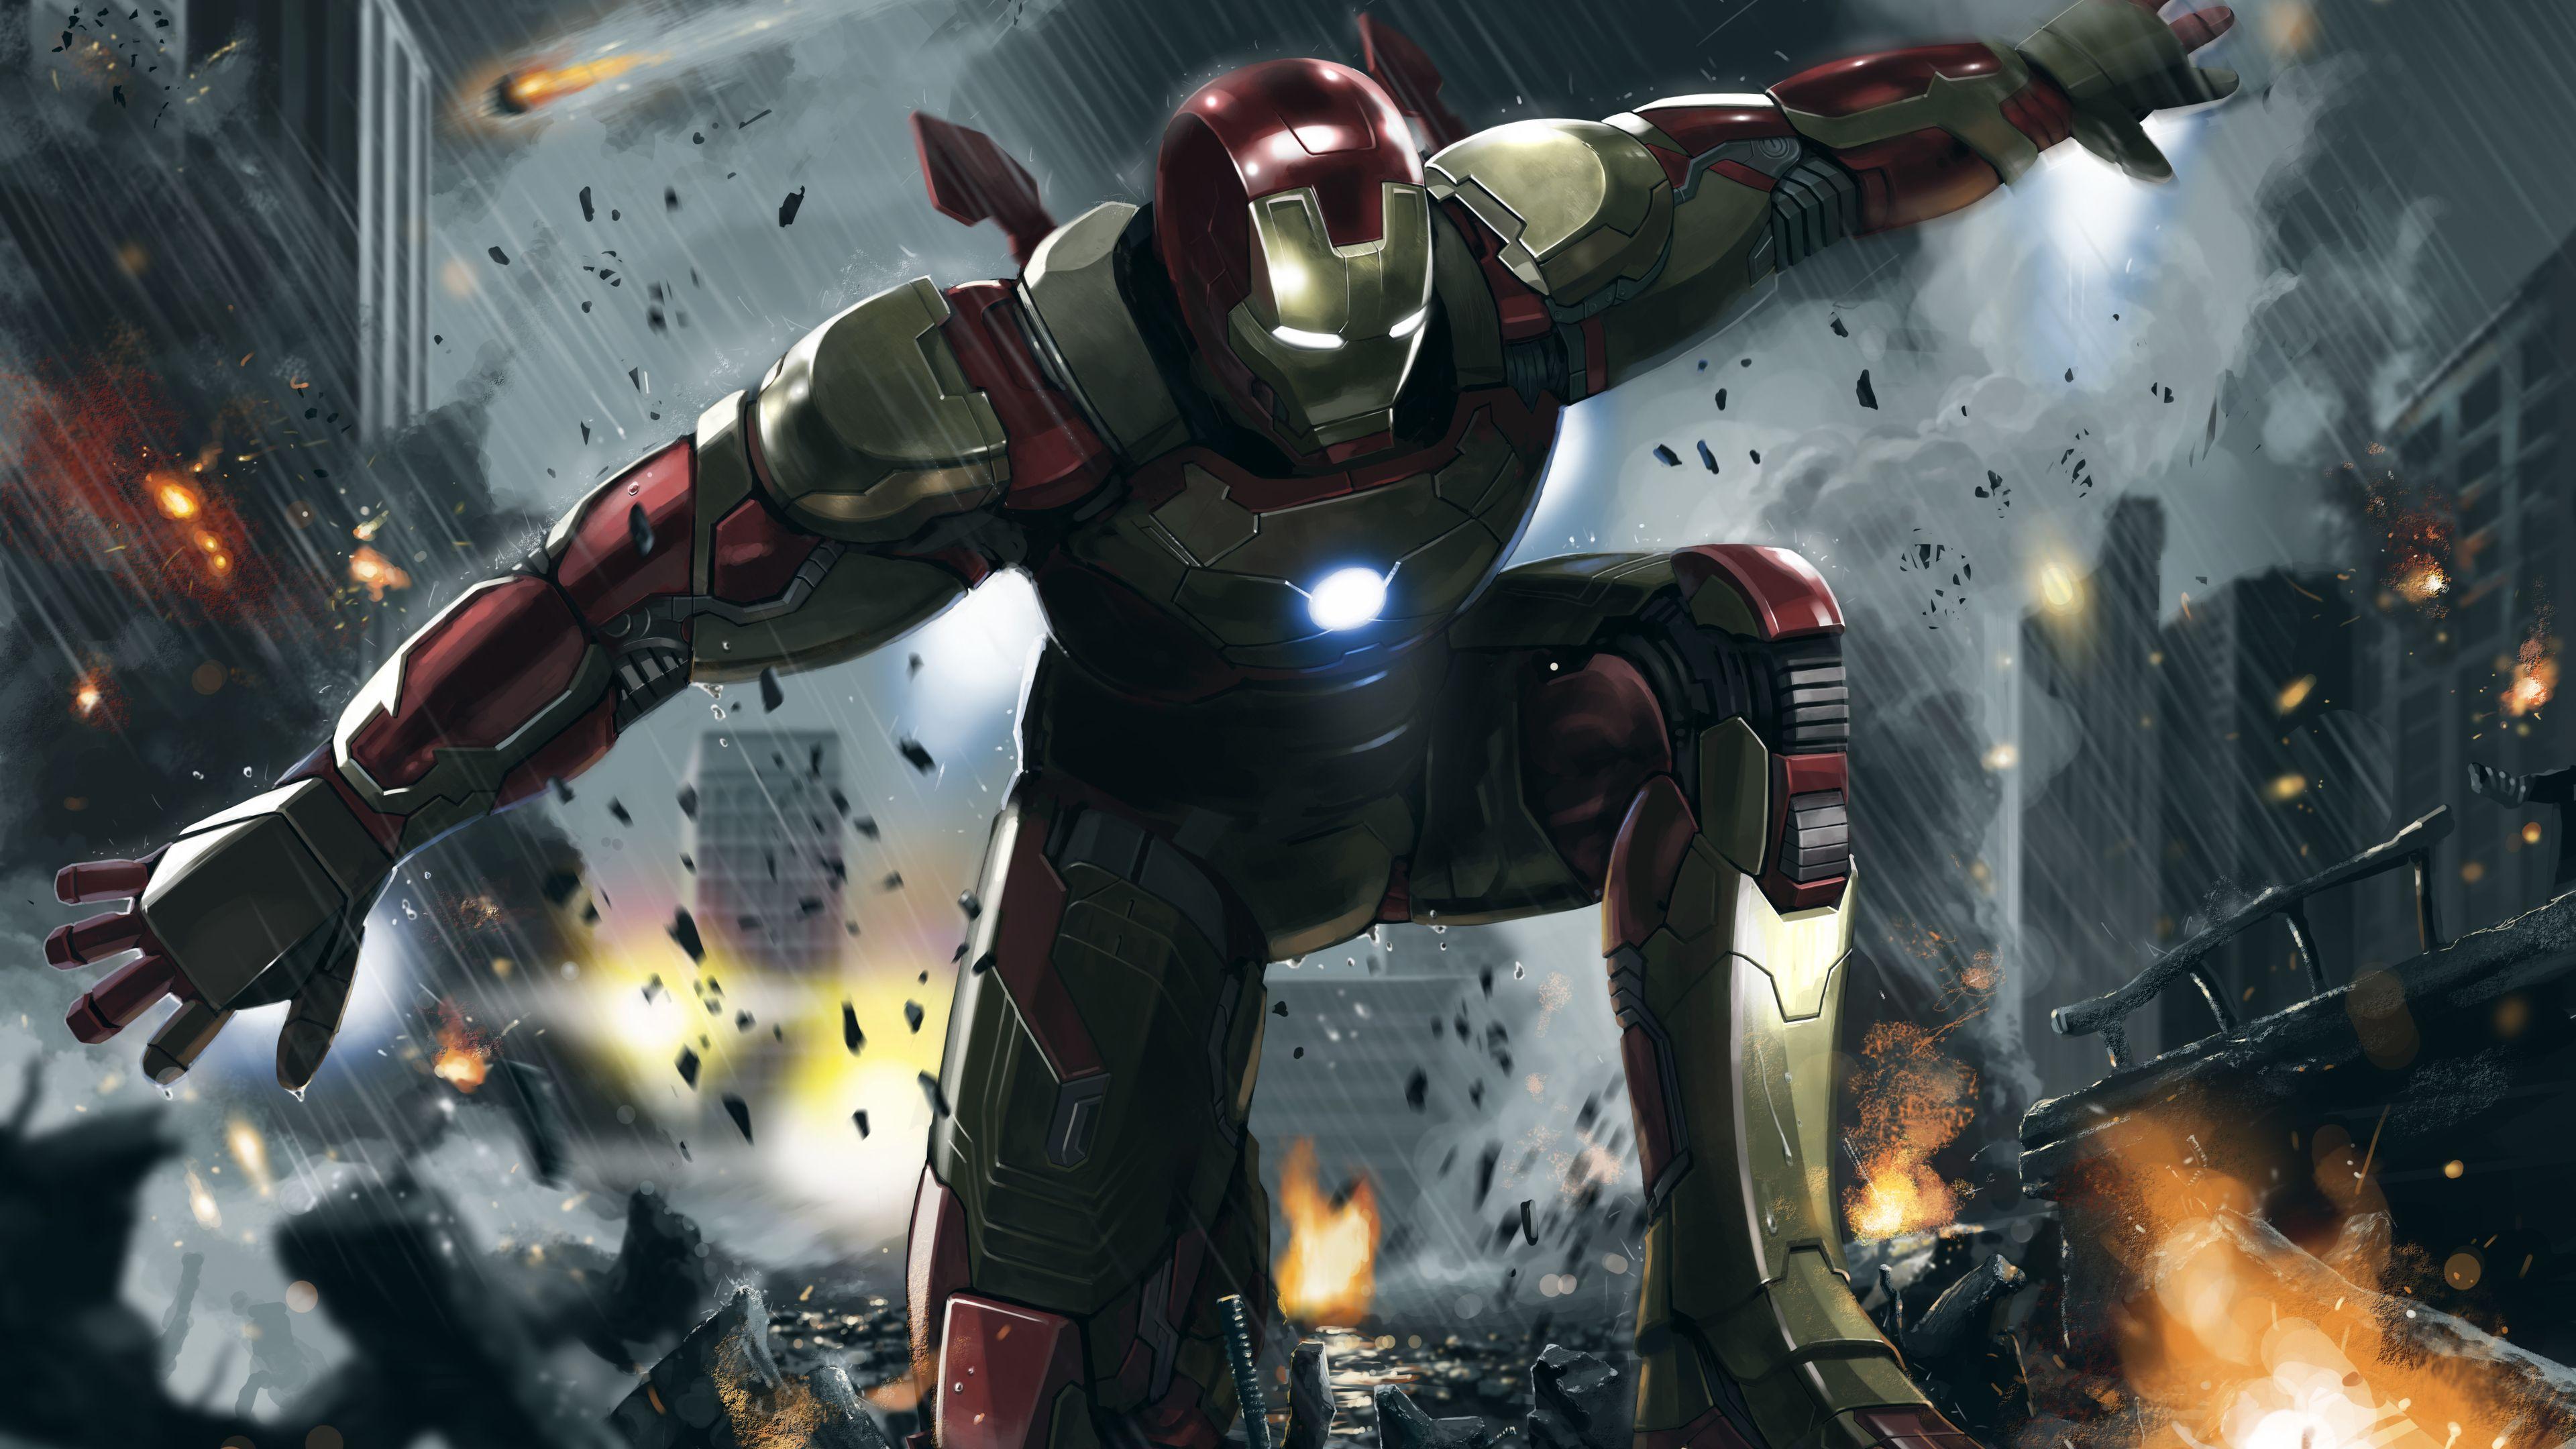 Iron Man 3 Art 4k Superheroes Wallpapers Iron Man Wallpapers Hd Wallpapers Digital Art Wallpapers Artwork Wallp Iron Man Wallpapers Superhero Man Wallpaper